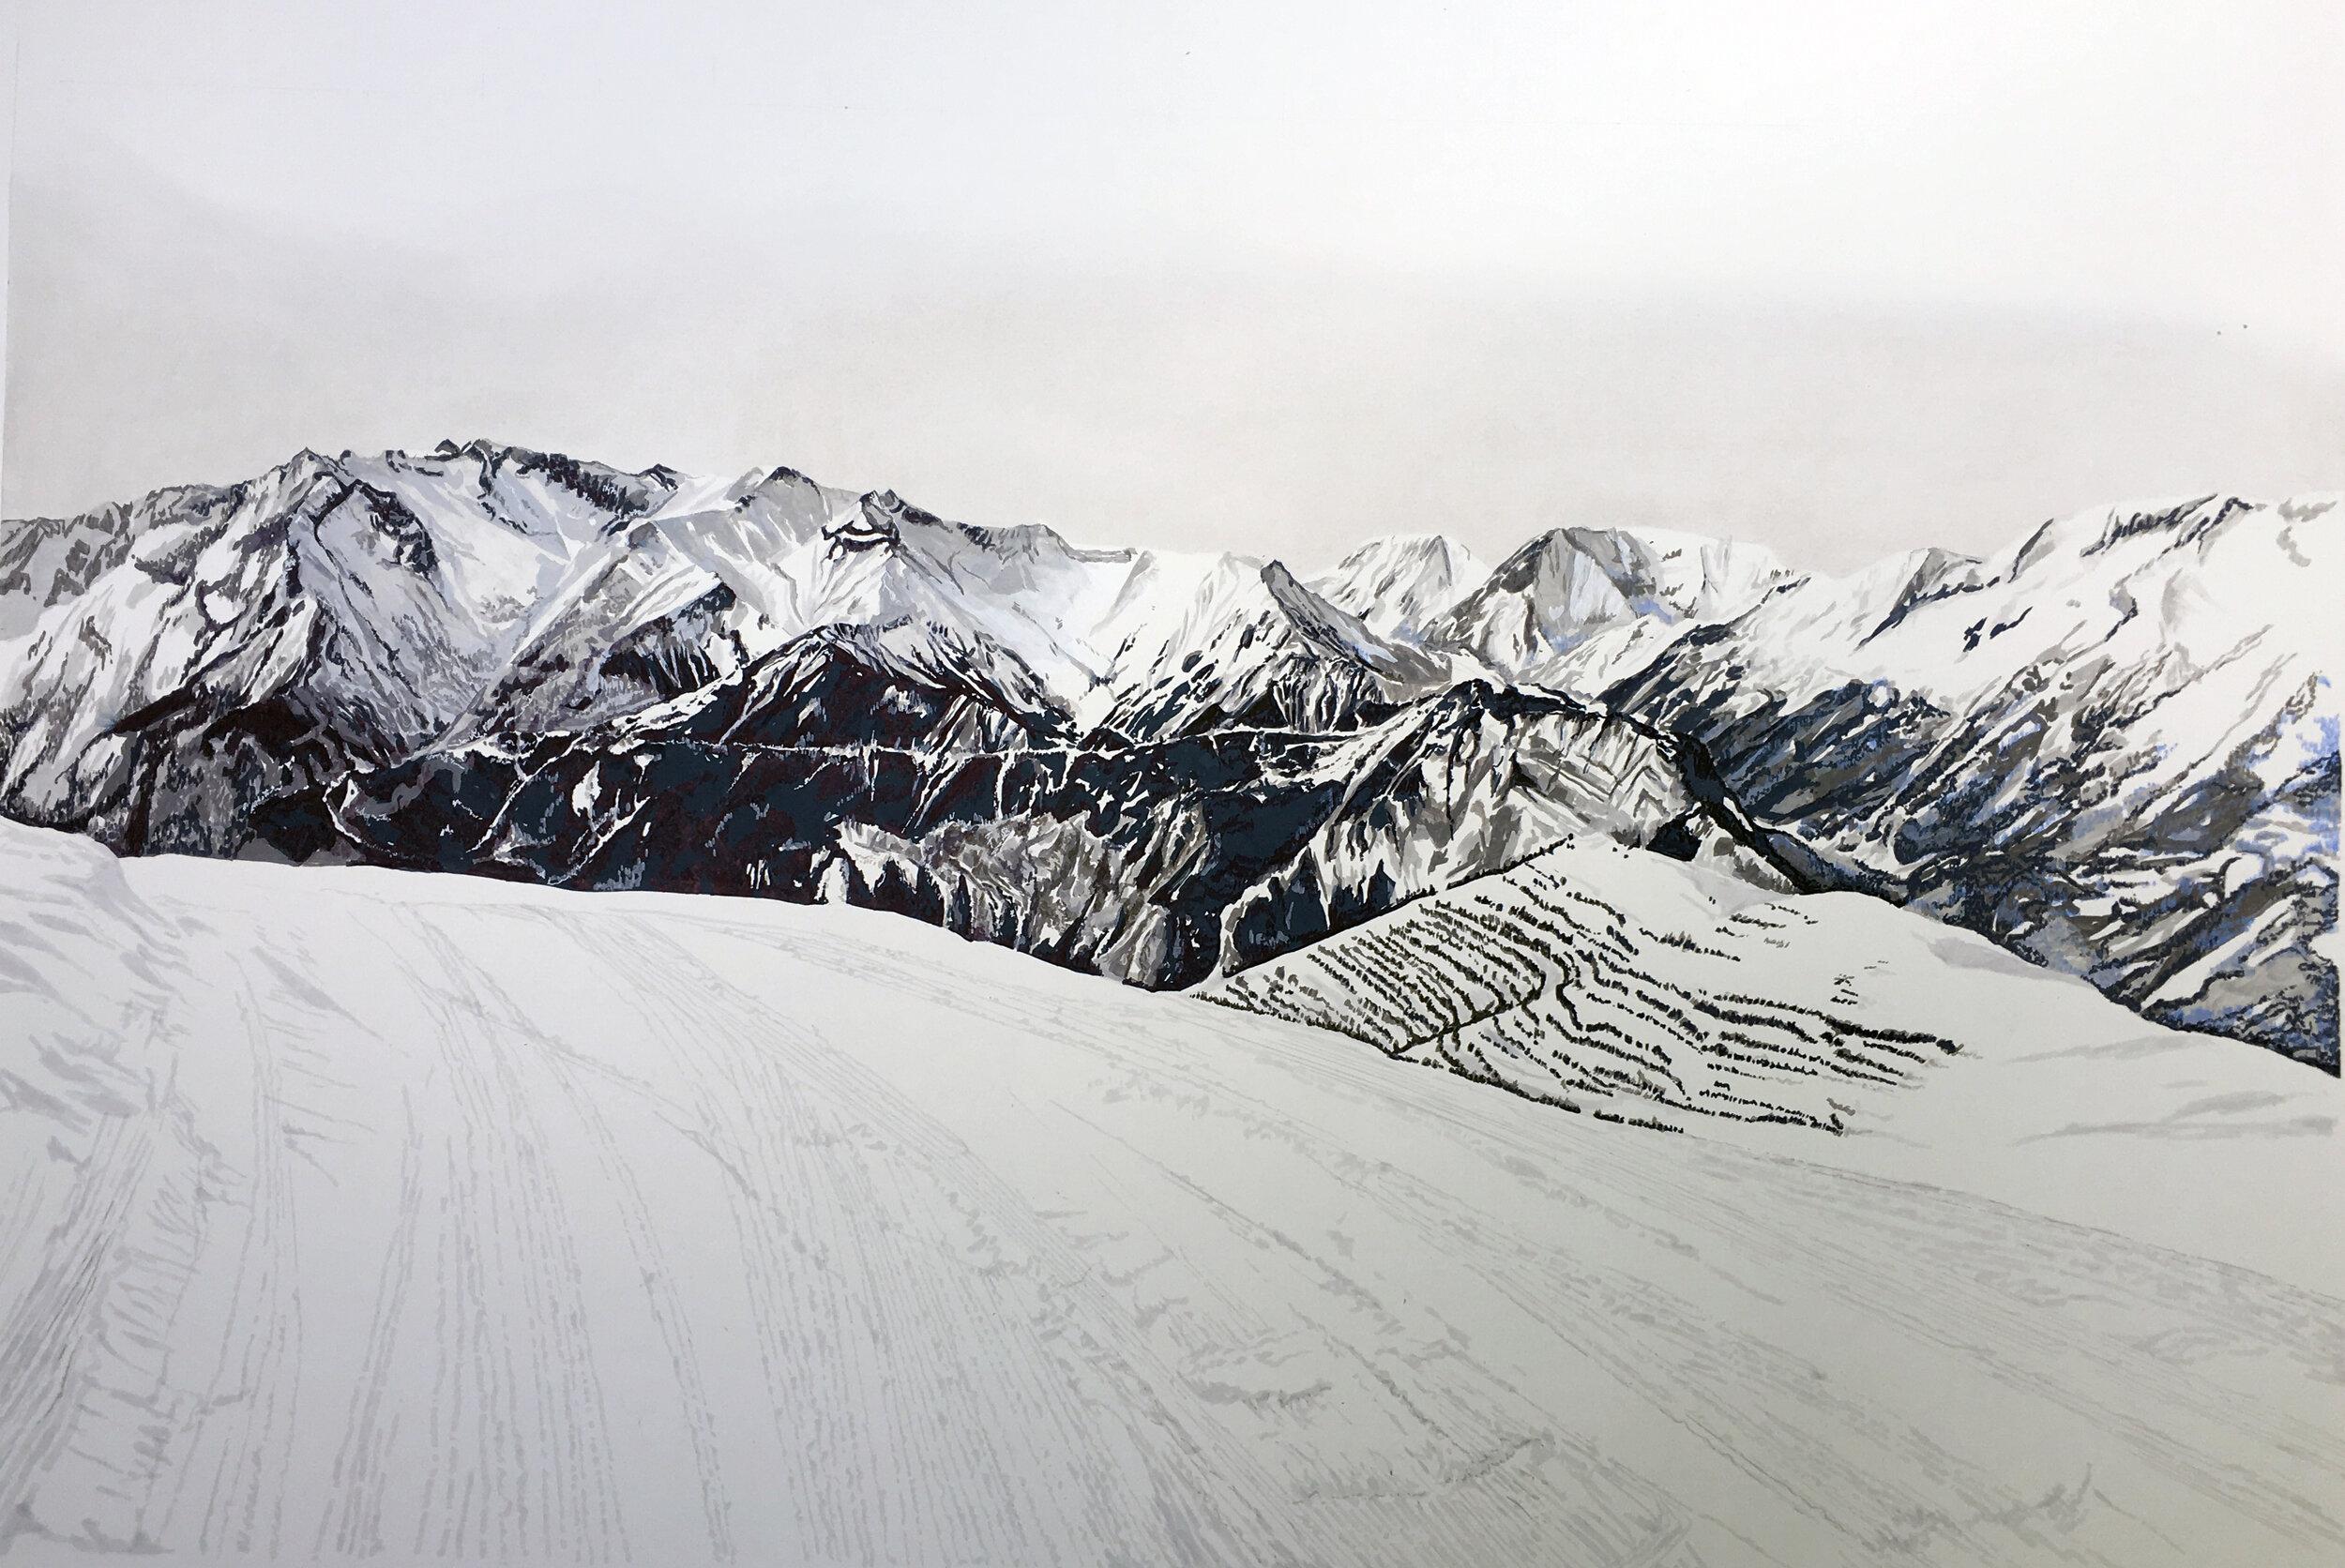 Alpe d'huez, France, 1m x 1.5m, Pen, Paint Marker & Pastel on Mountboard, £3200 - Sam Gare.jpg